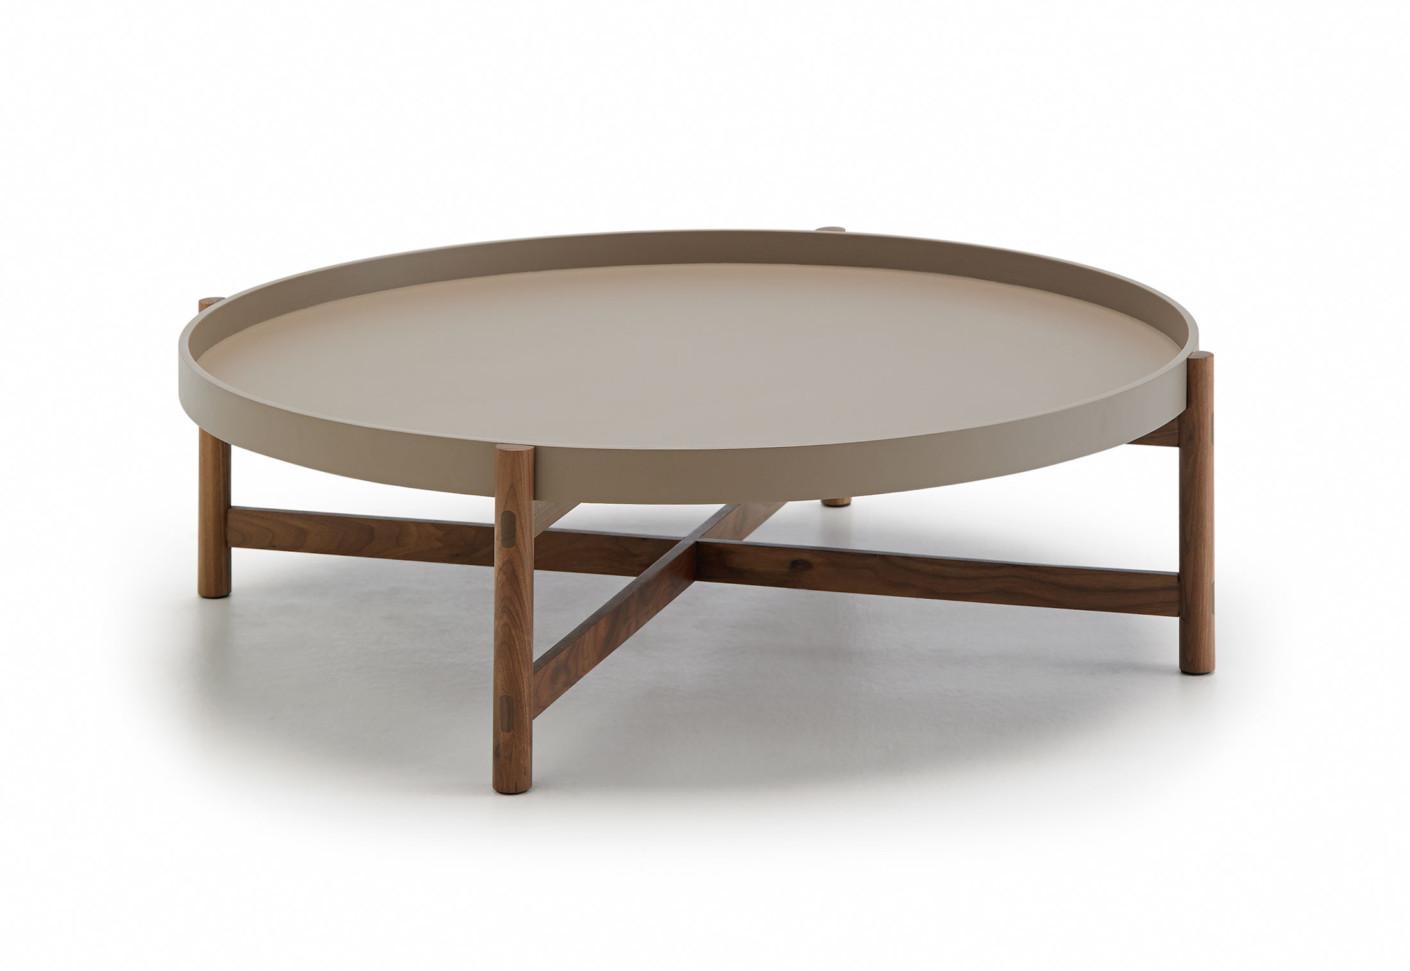 Mai Tai coffee table by Punt | STYLEPARK